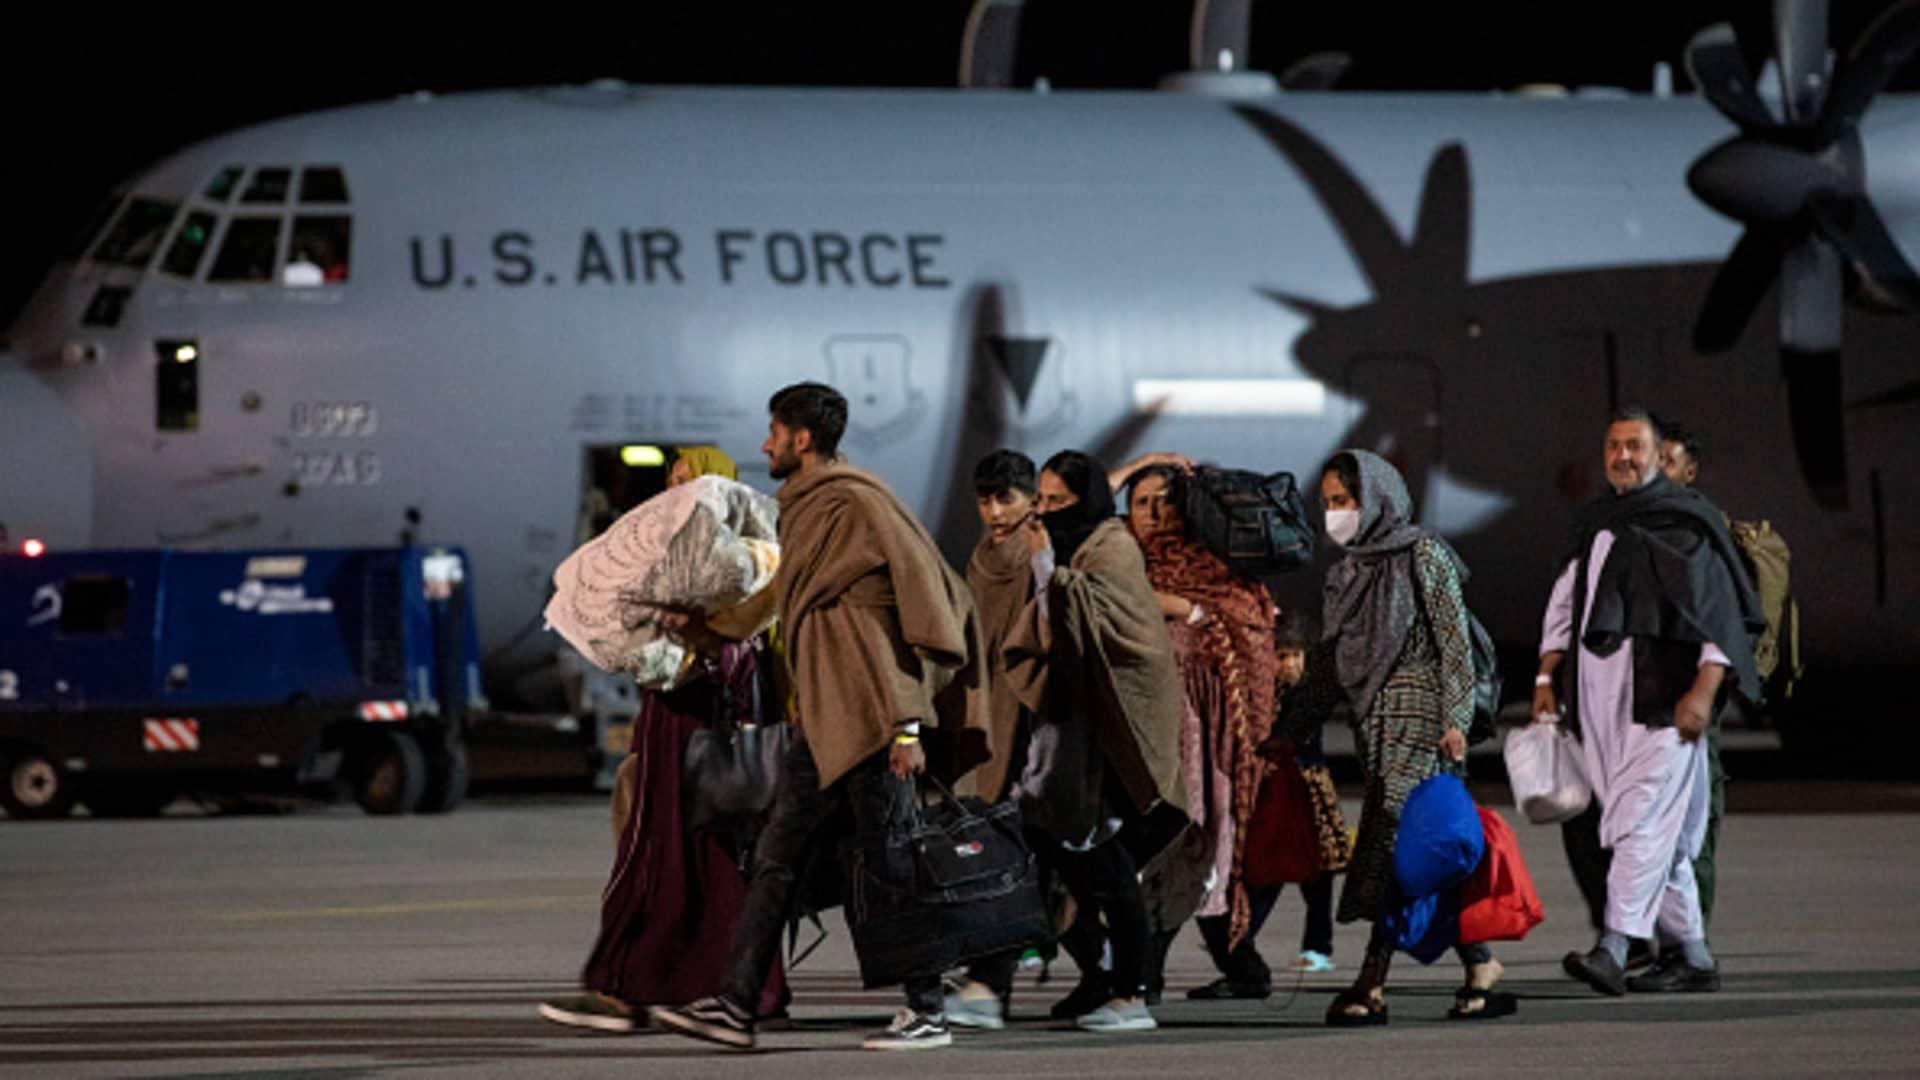 Afghan evacuees arrive at Pristina International Airport in Pristina, Kosovo, via a U.S. Air Force cargo plane, on Aug. 29, 2021.